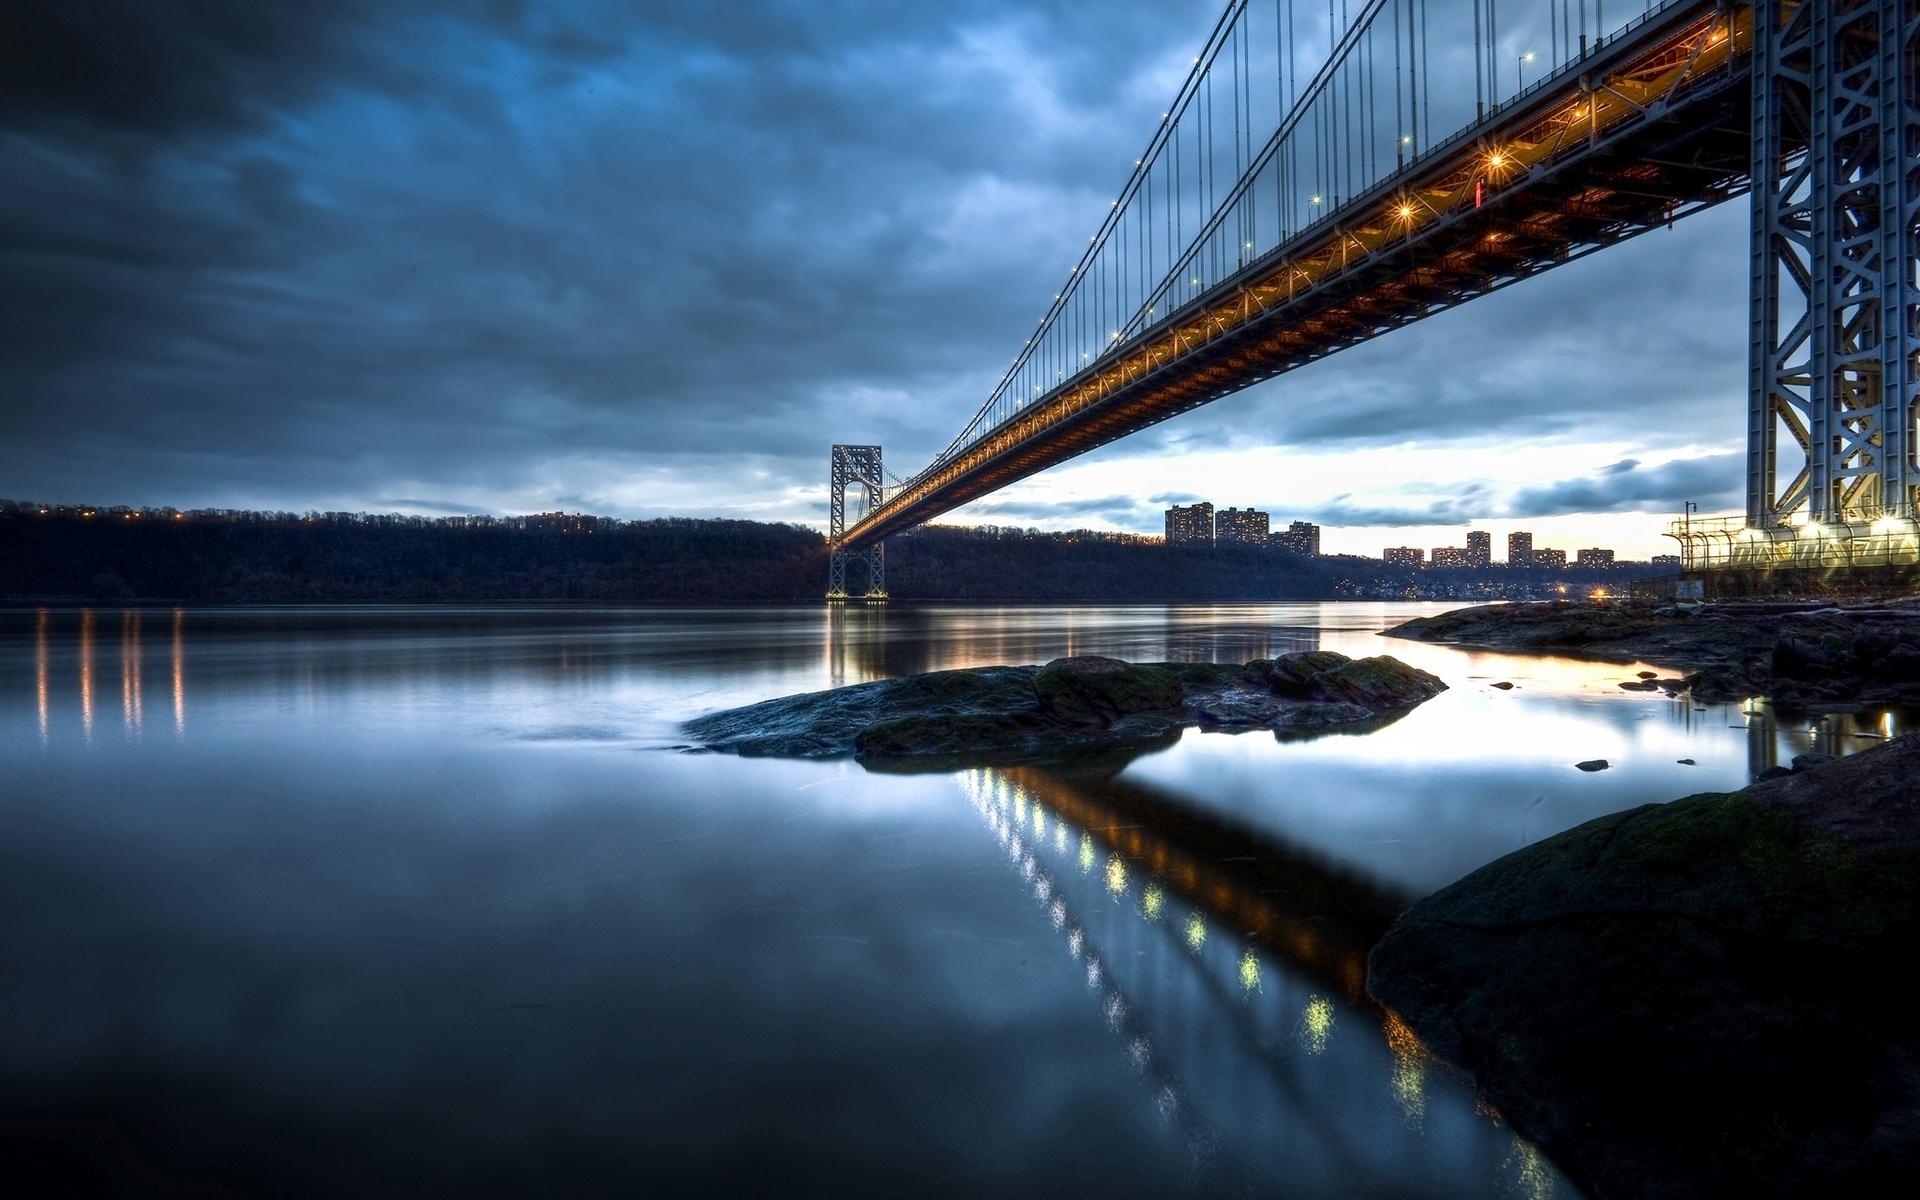 George Washington Bridge Widescreen Wallpaper   11862 1920x1200